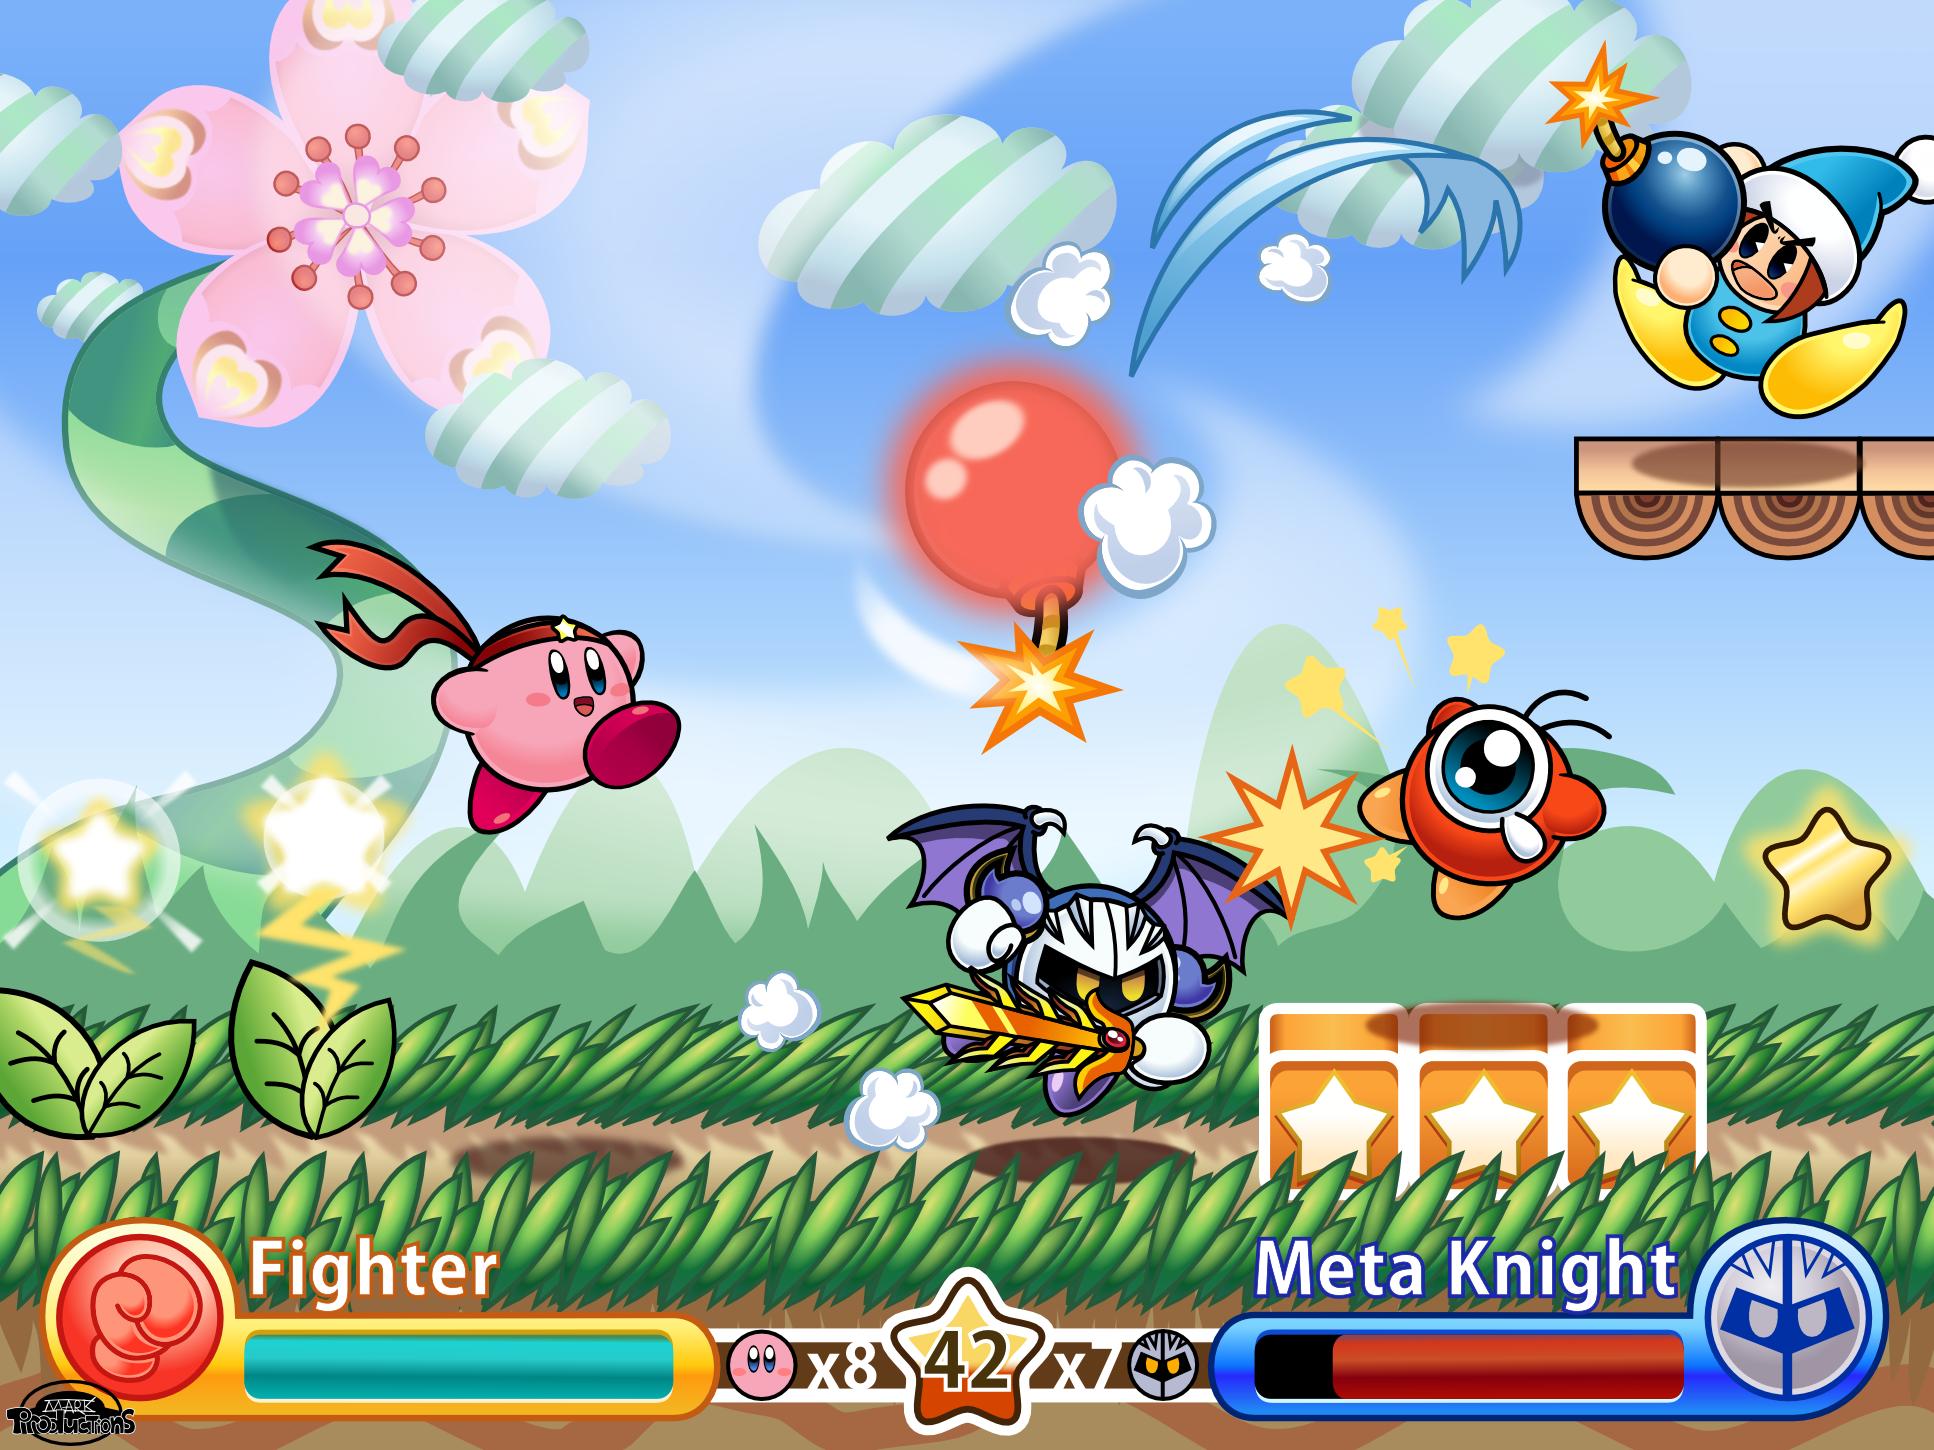 Kirby Hyper Nova - HD screenshot (fanmade game) by MarkProductions